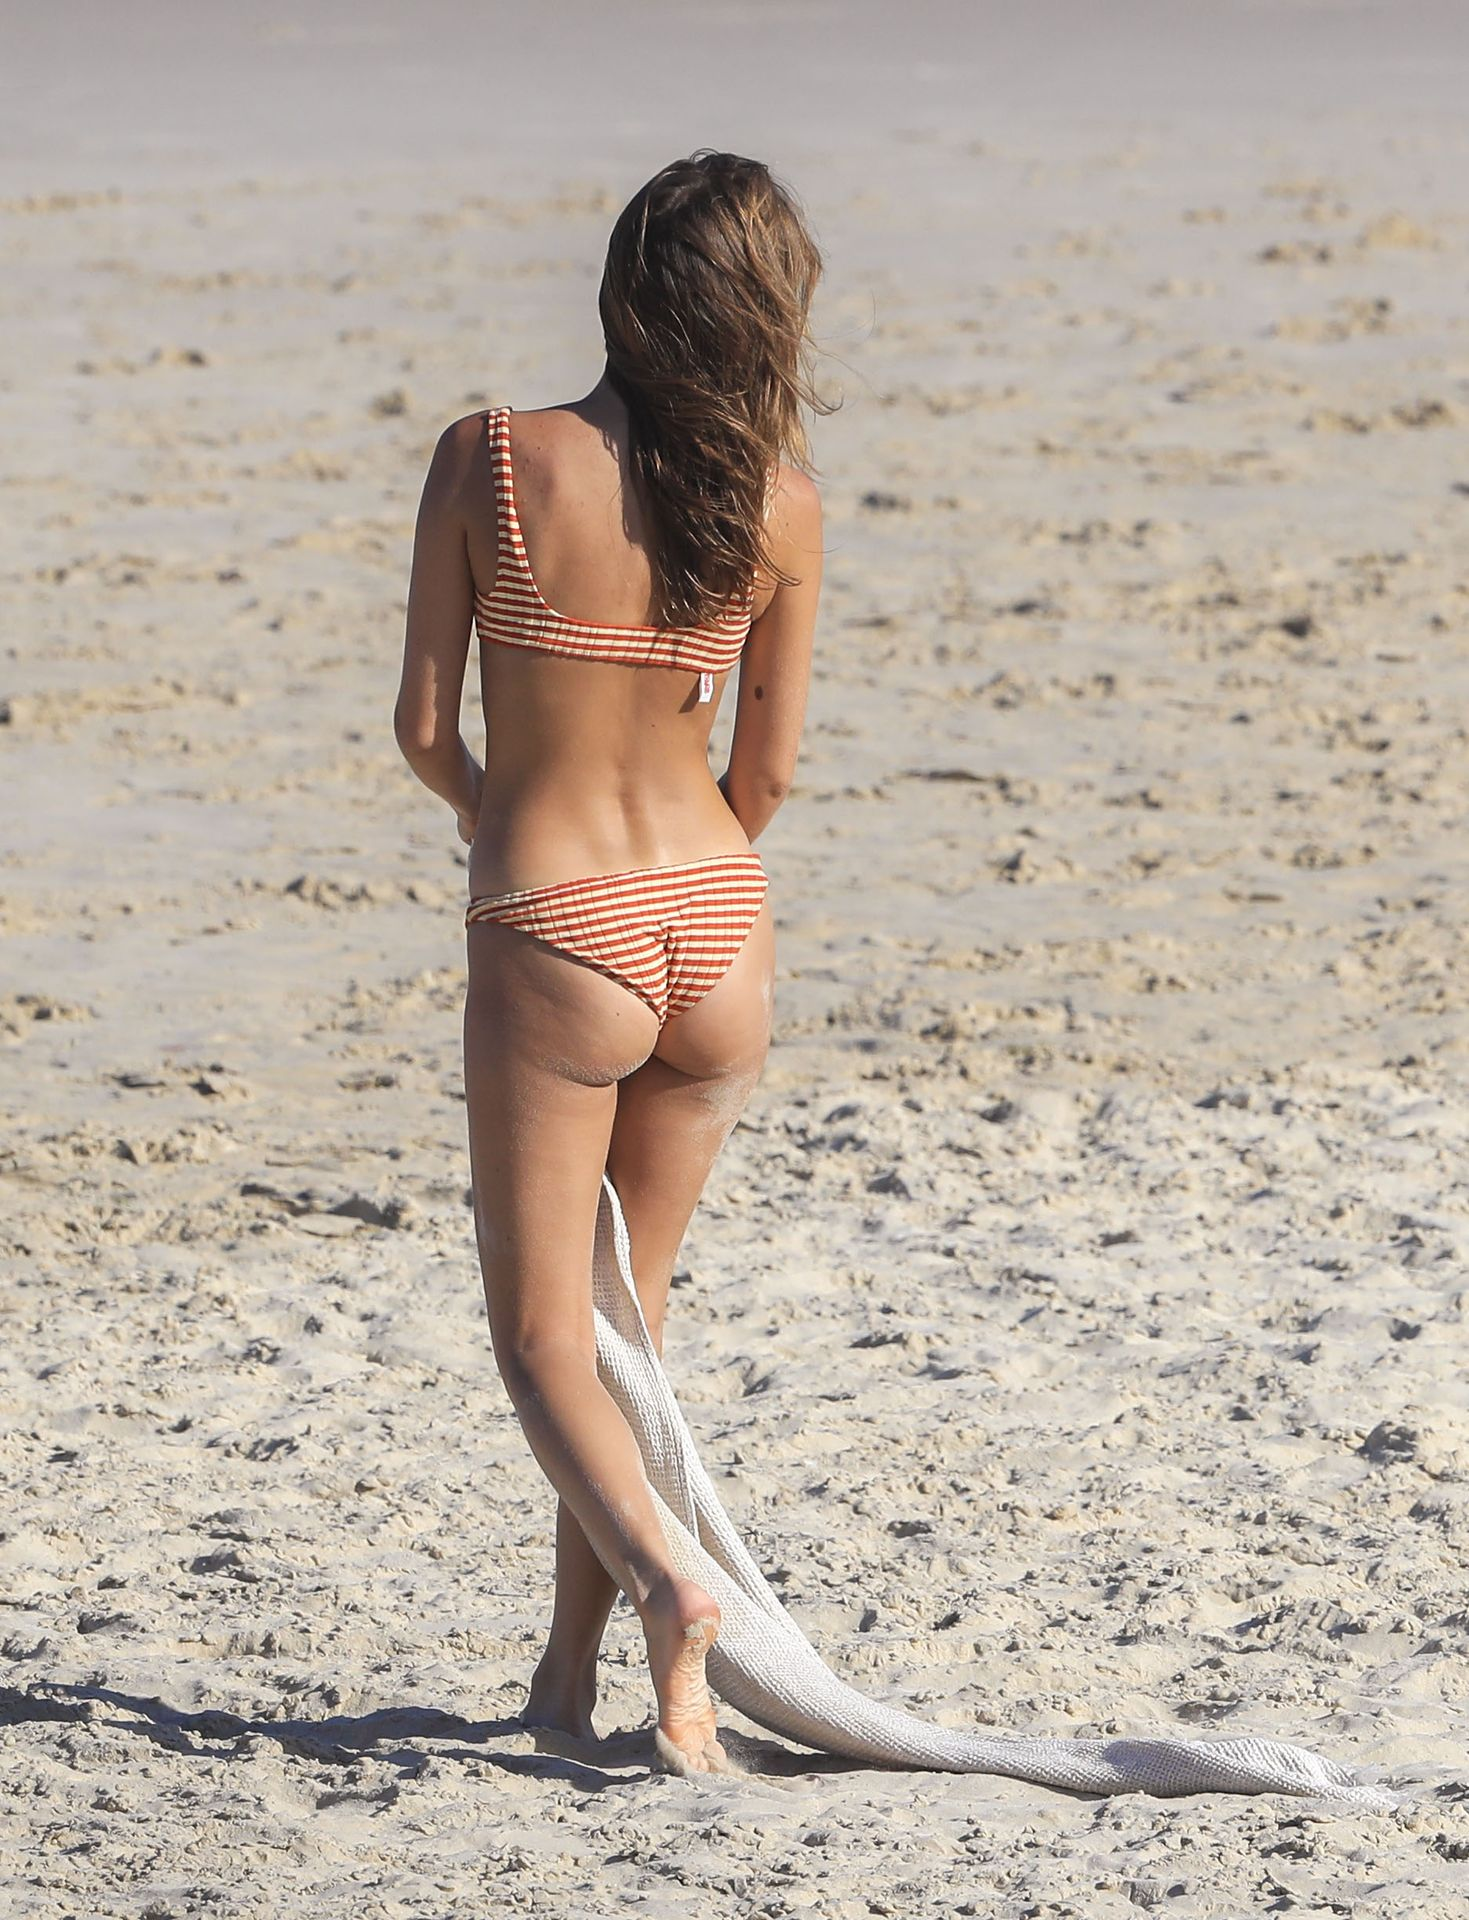 Gabriella Brooks Hot – Liam Hemsworth's New Girlfriend 0051